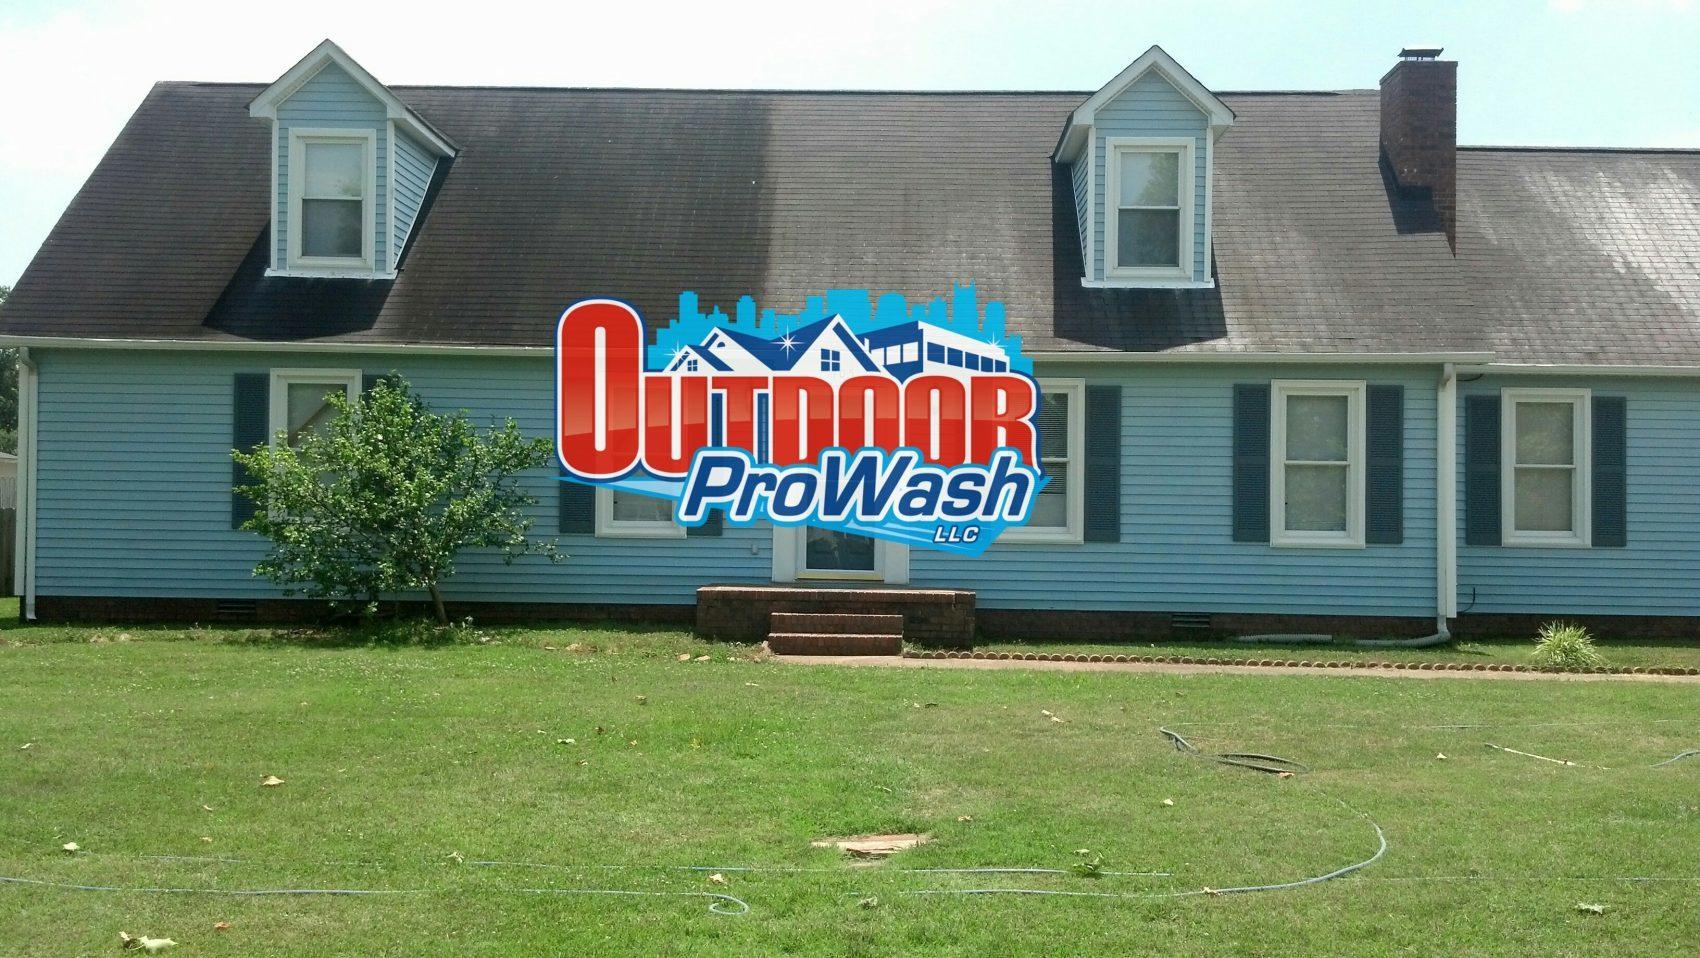 Pressure Washing Murfreesboro Tn Outdoor Prowash